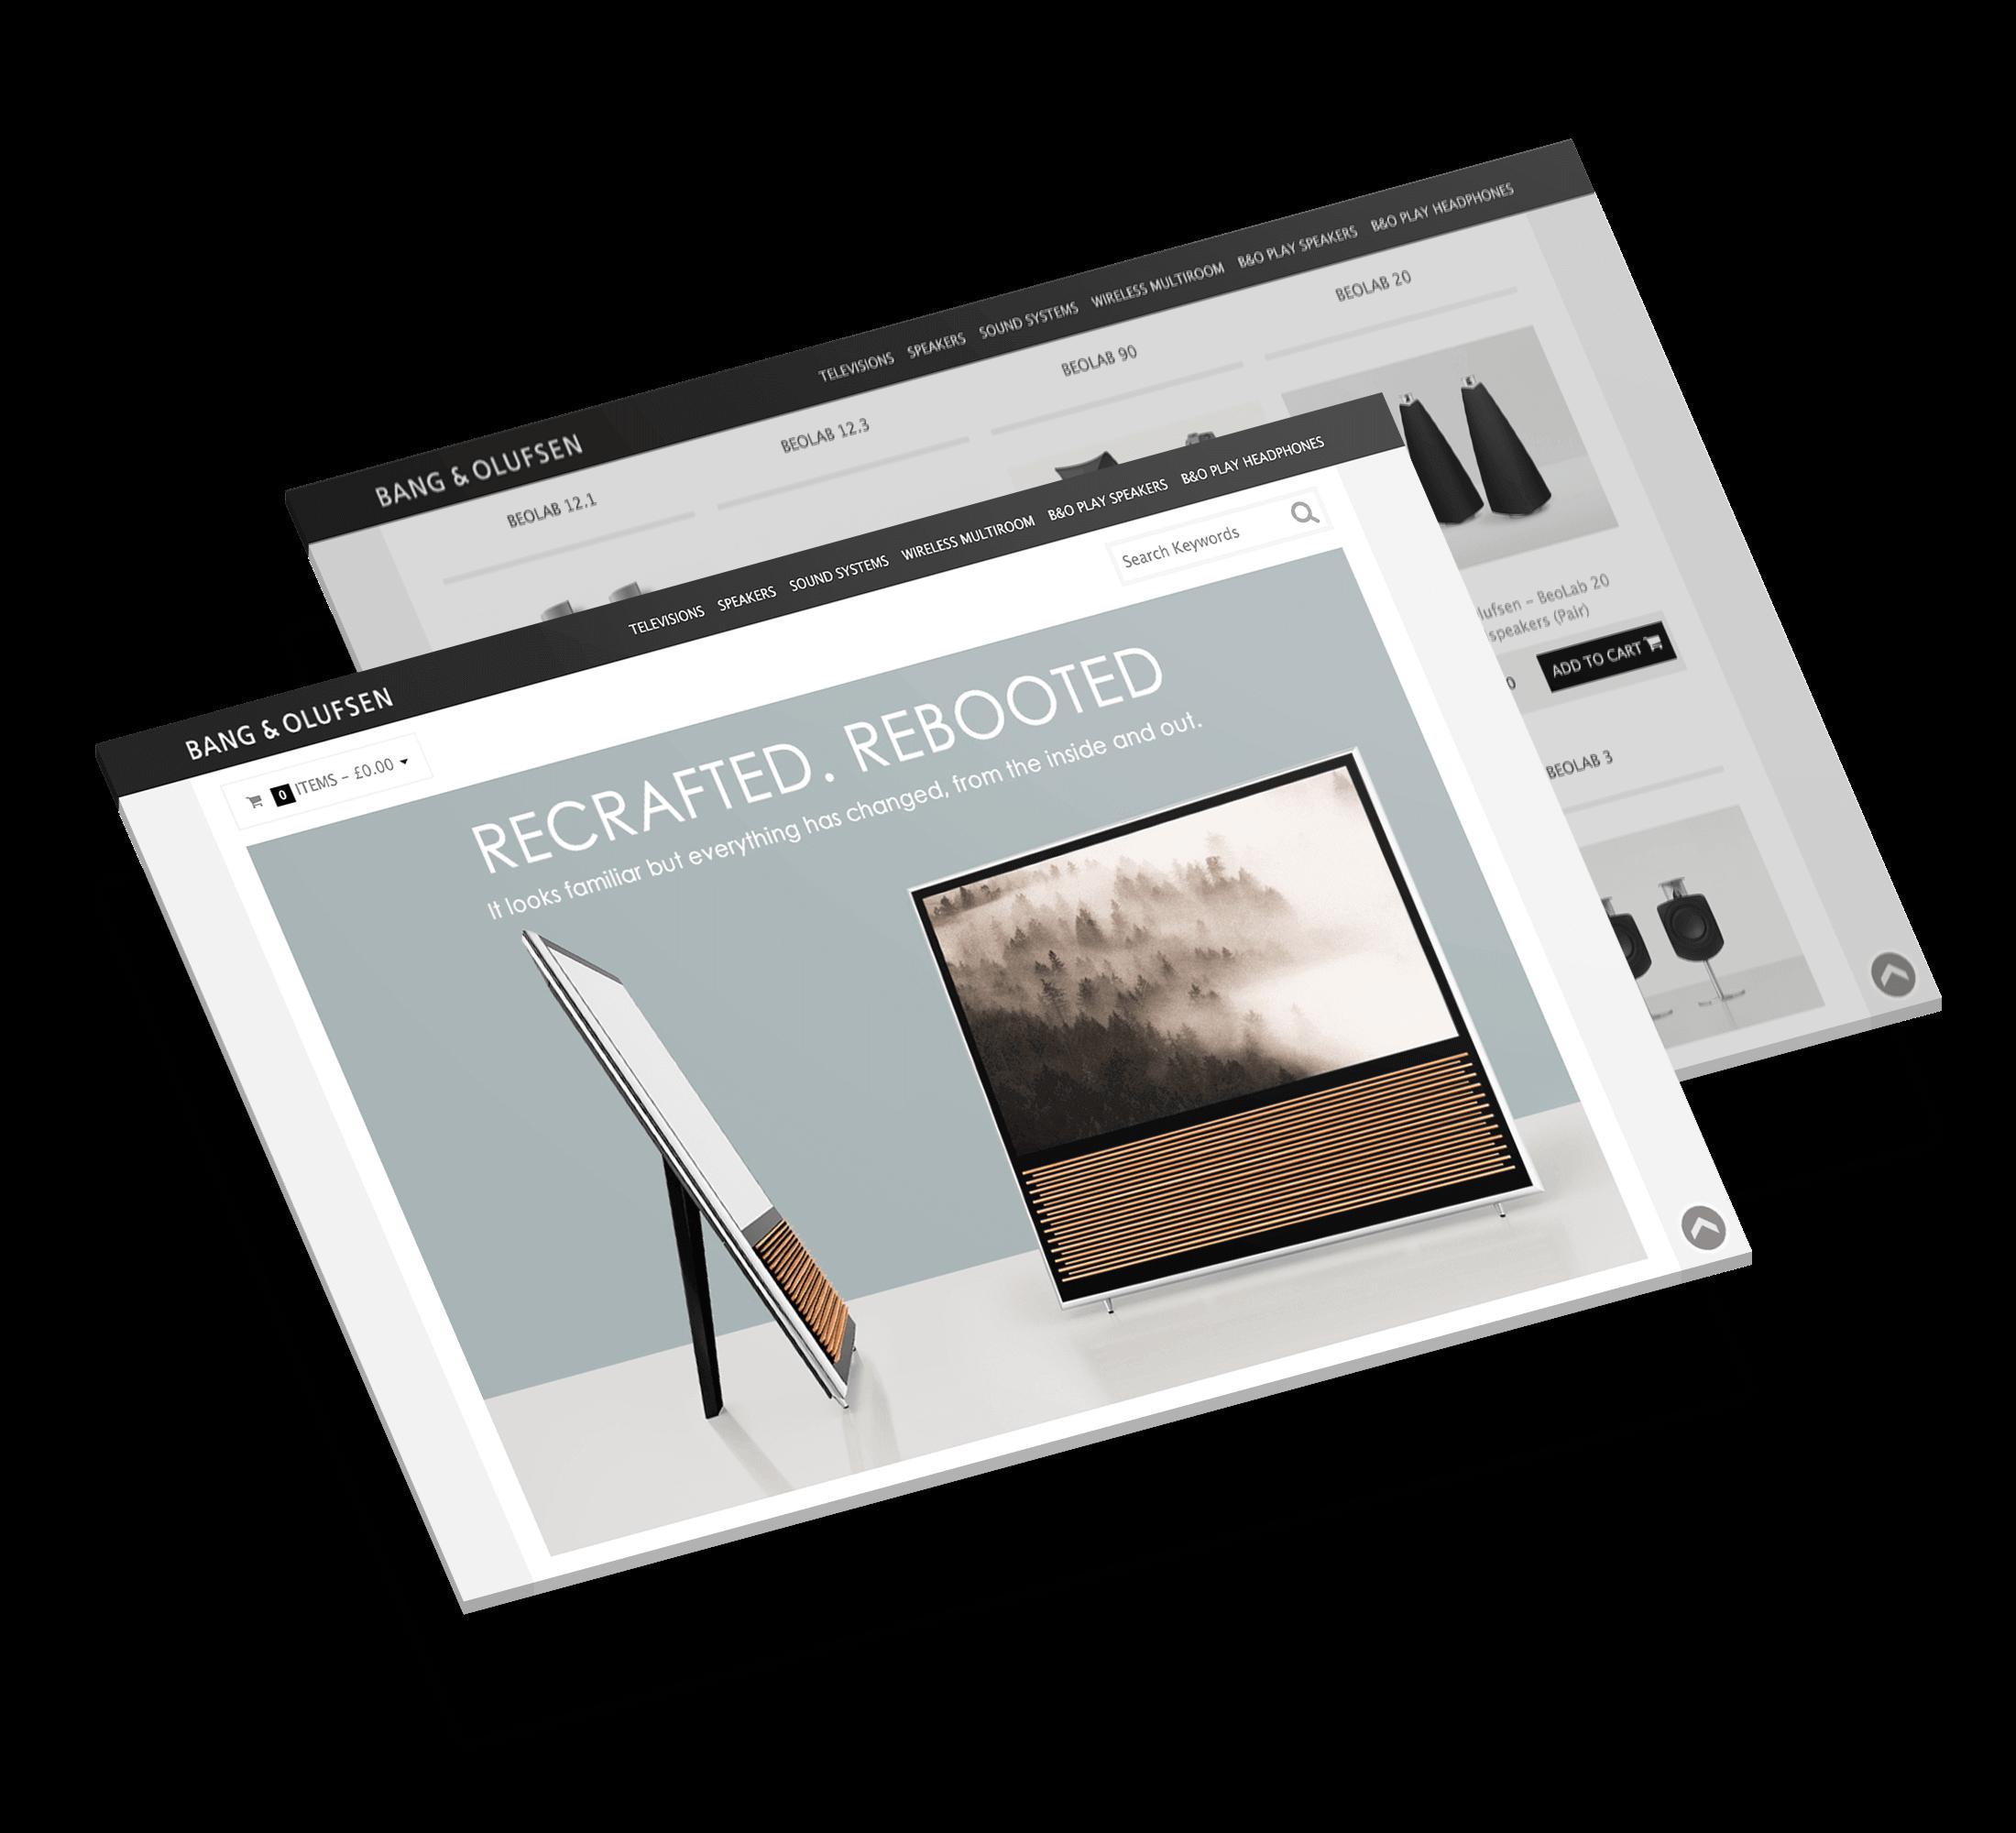 Bang & Olufsen - web design